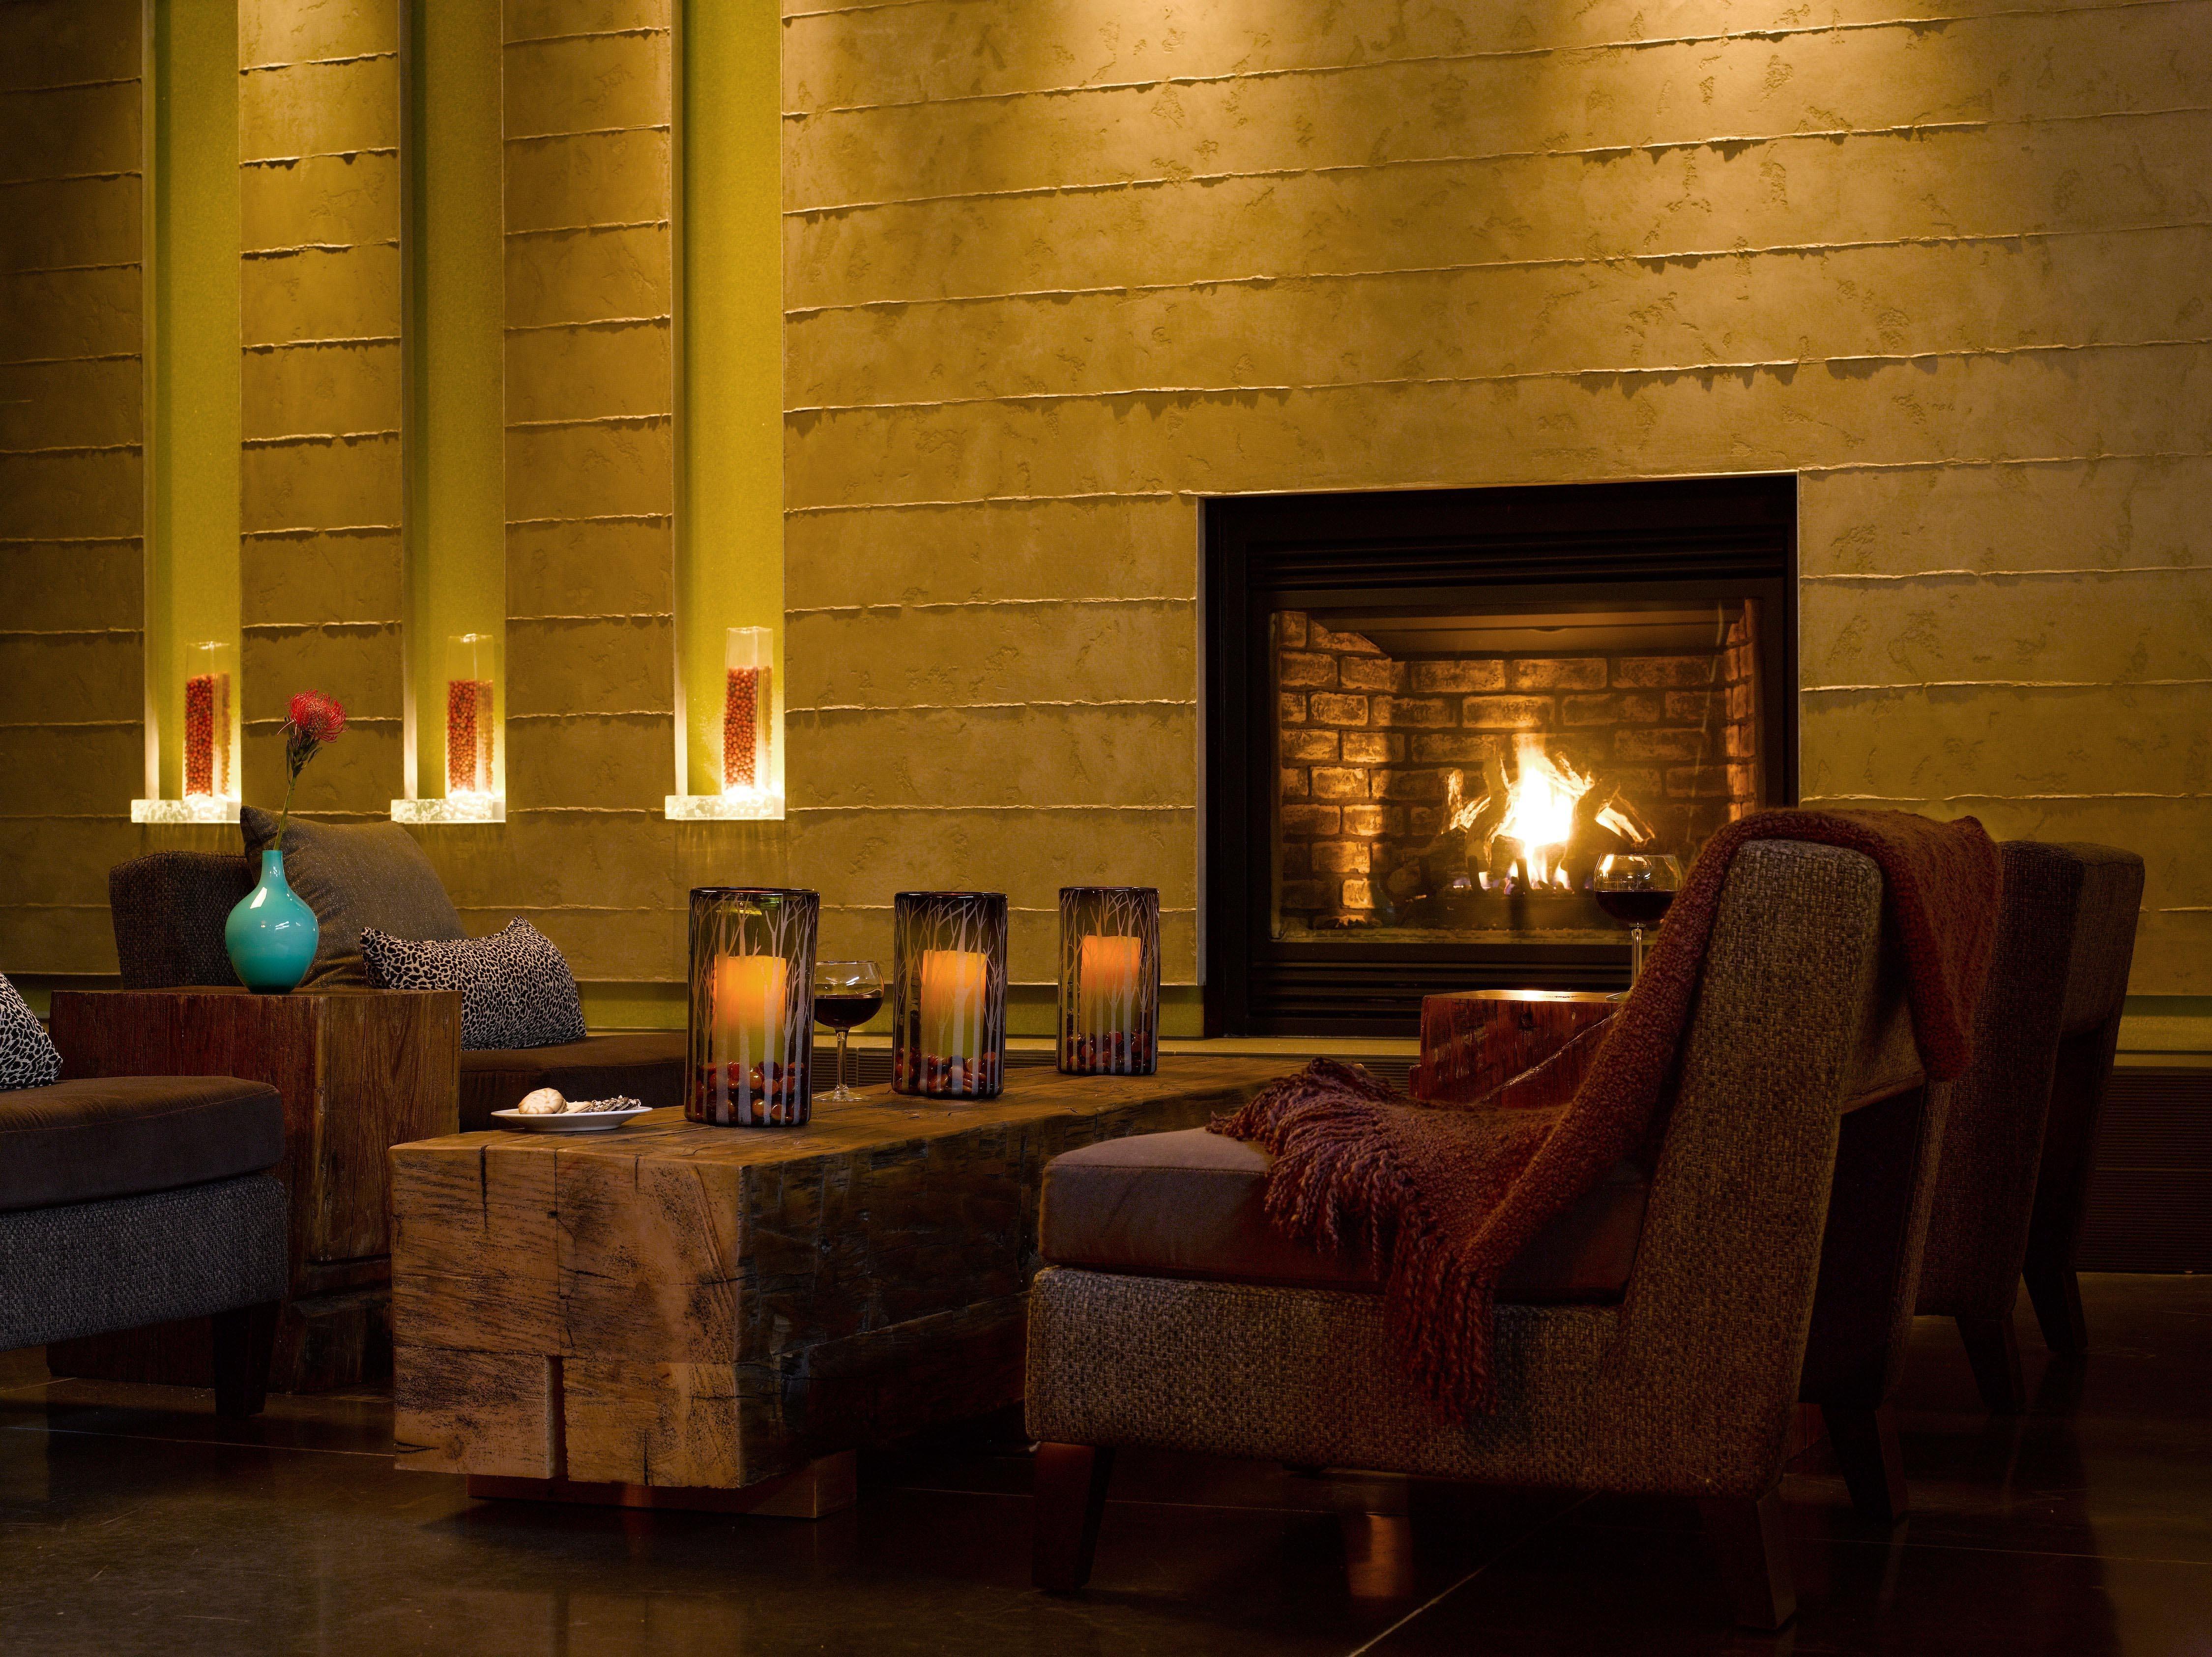 Hyatt House Seattle/Redmond image 2